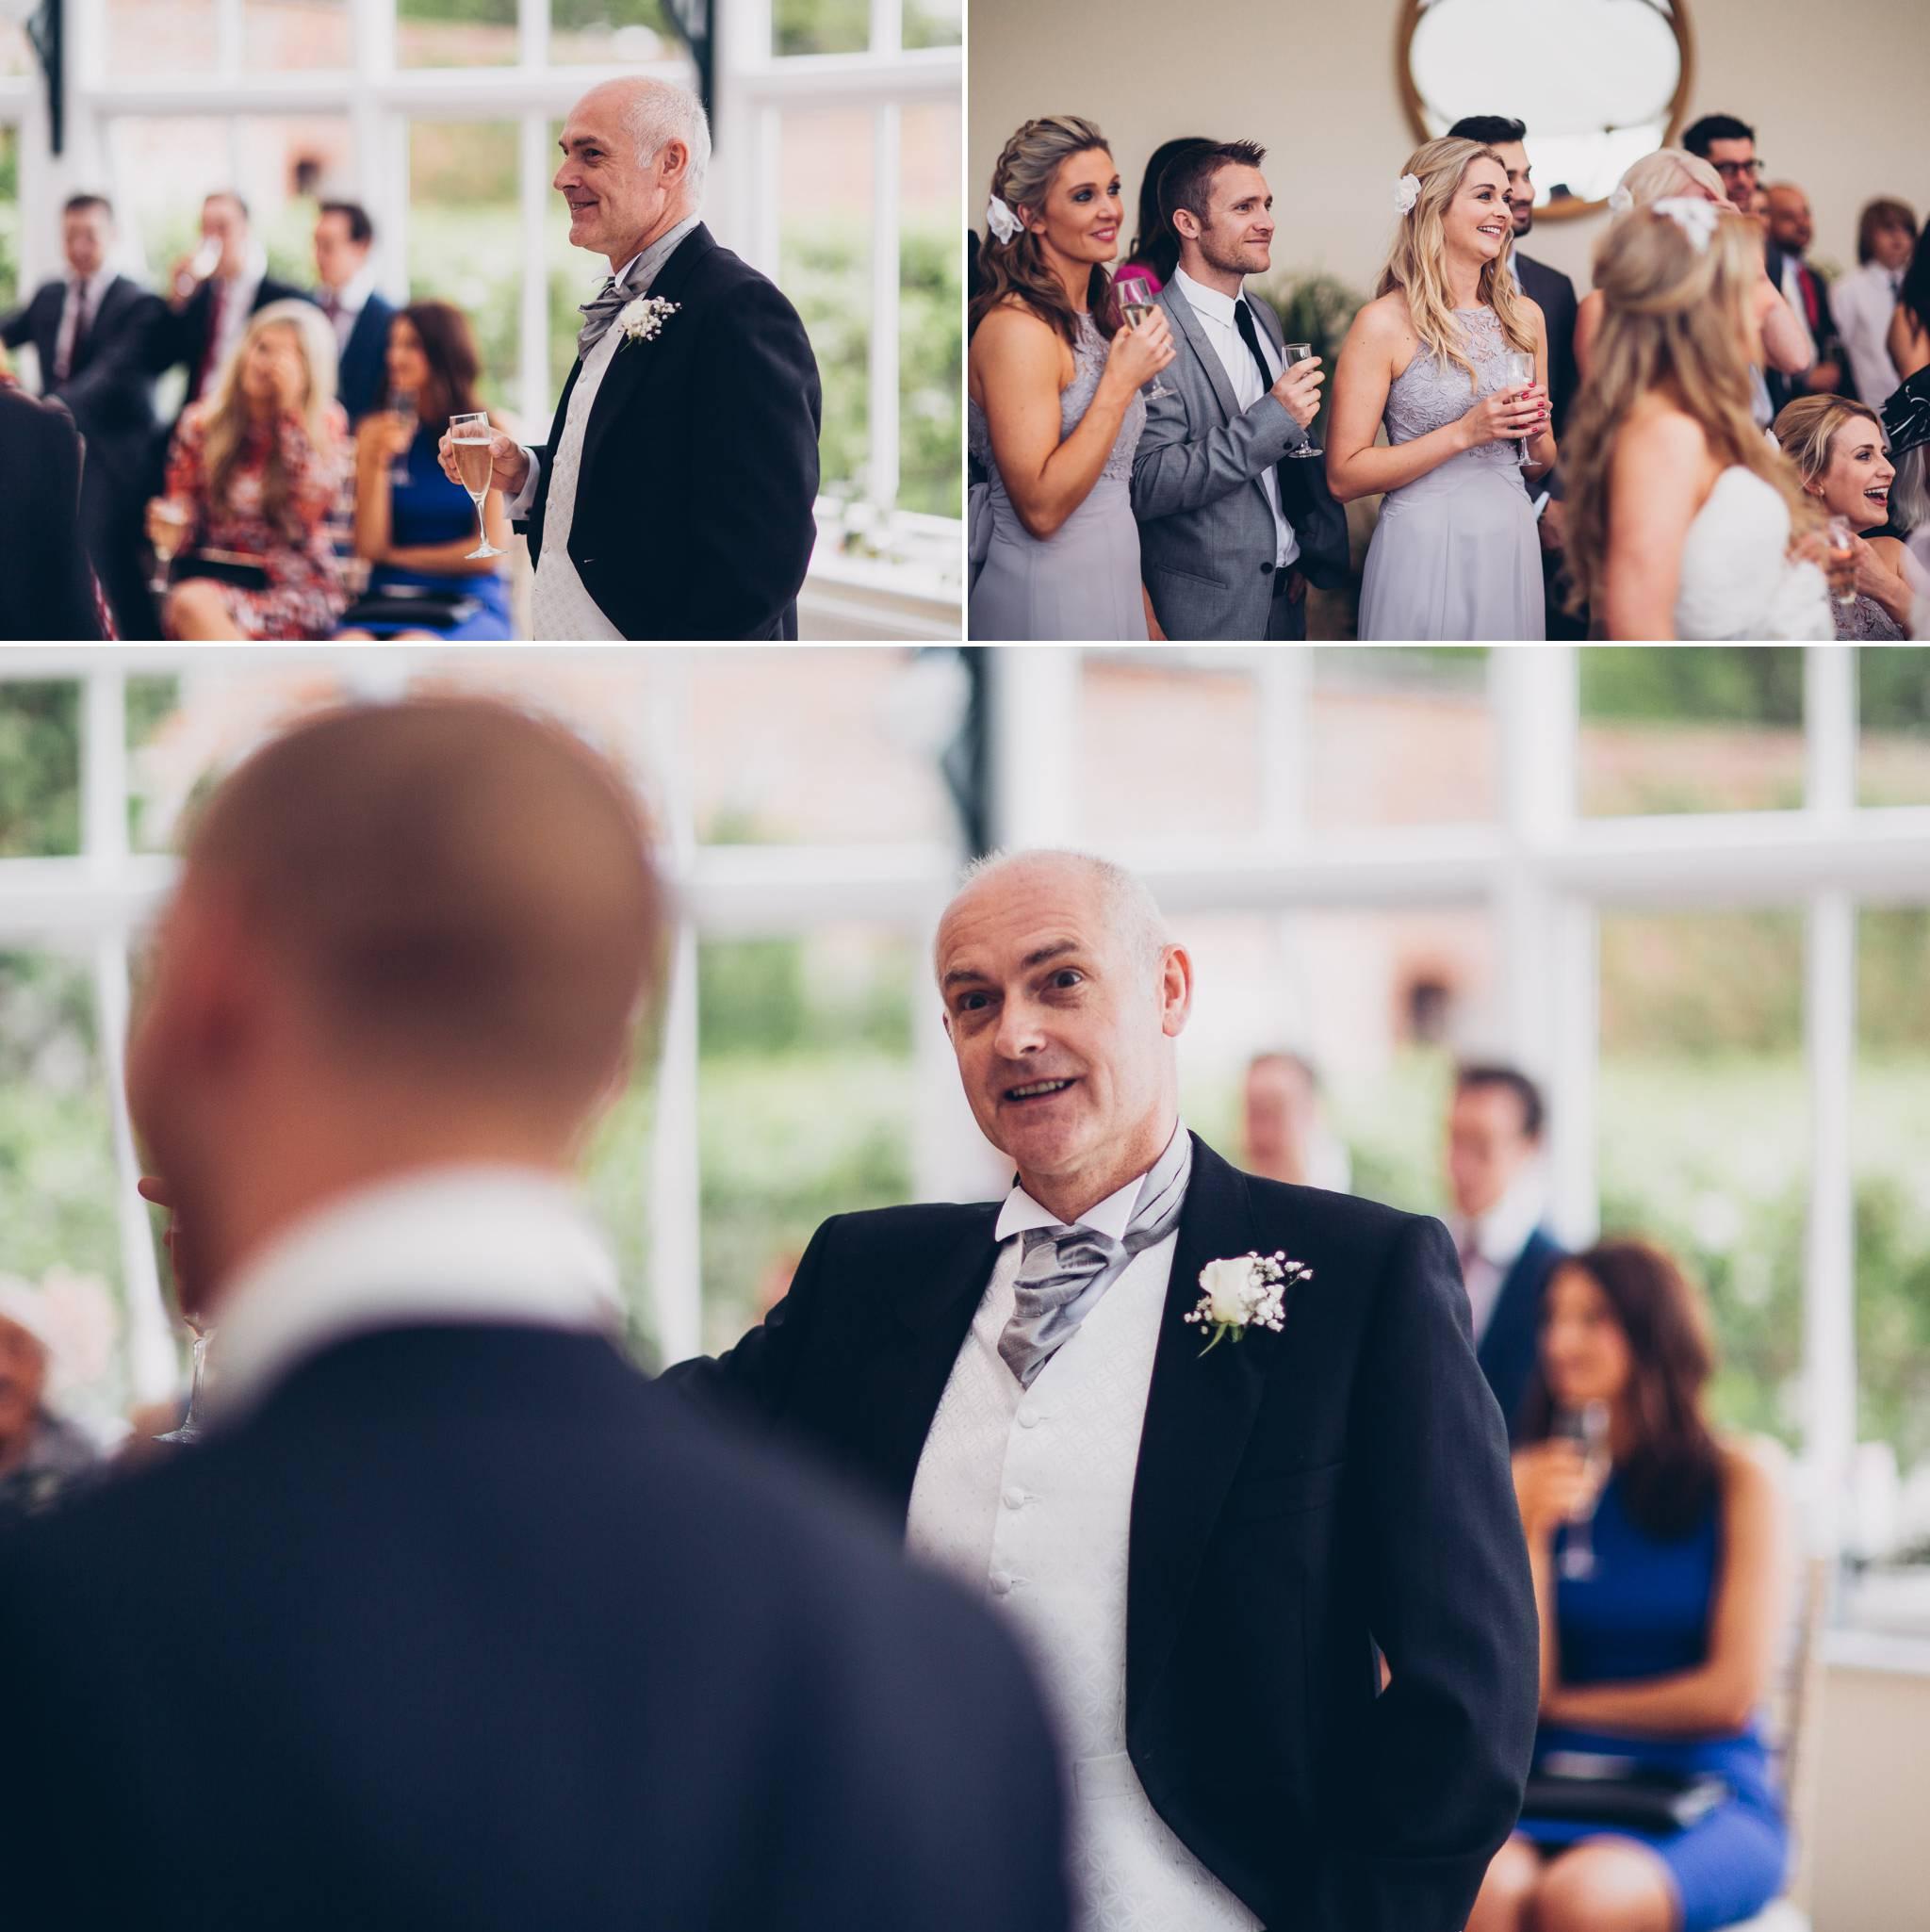 shropshire-wedding-photography 22.jpg